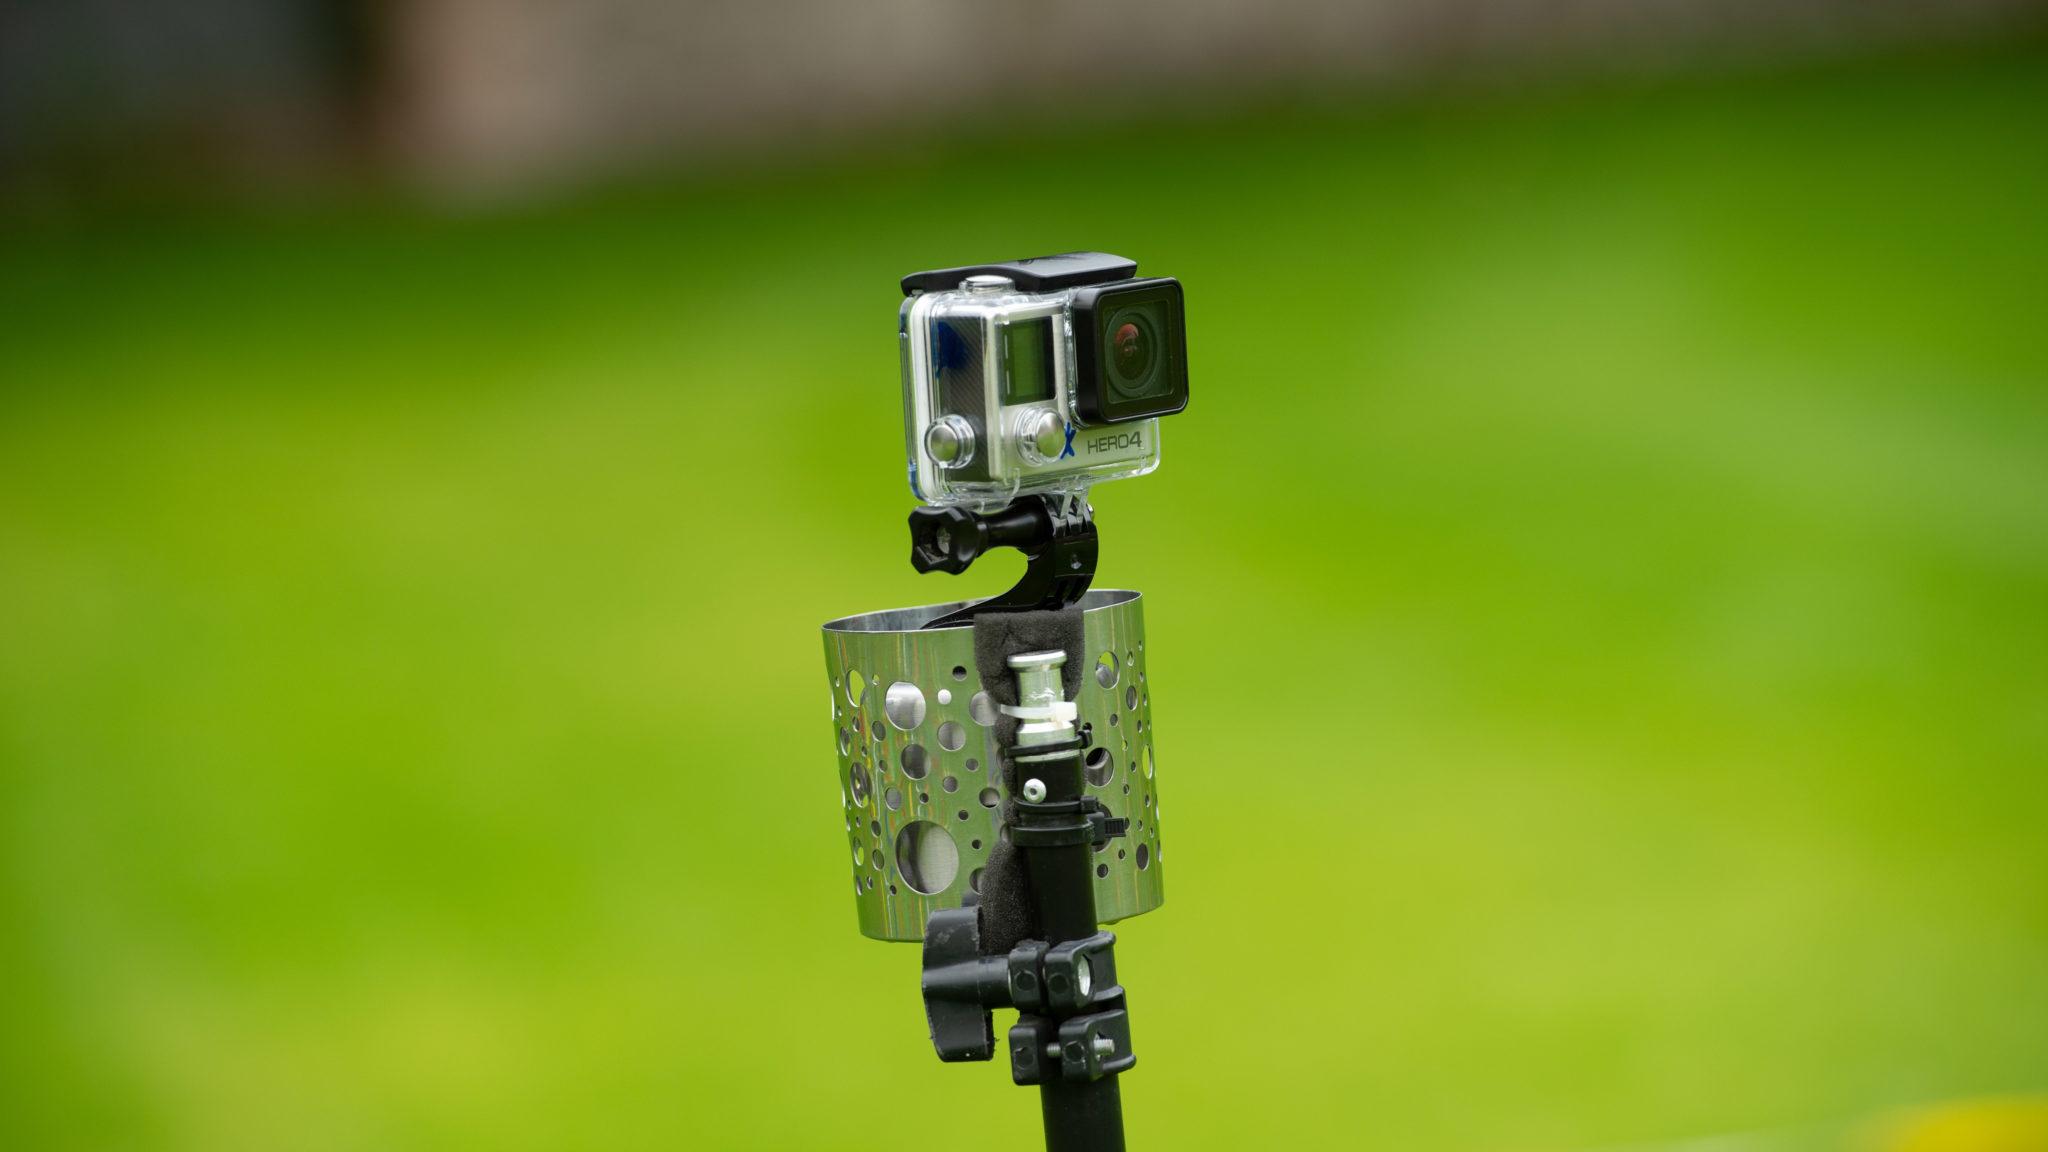 Go Pro Camera Time-Lapse